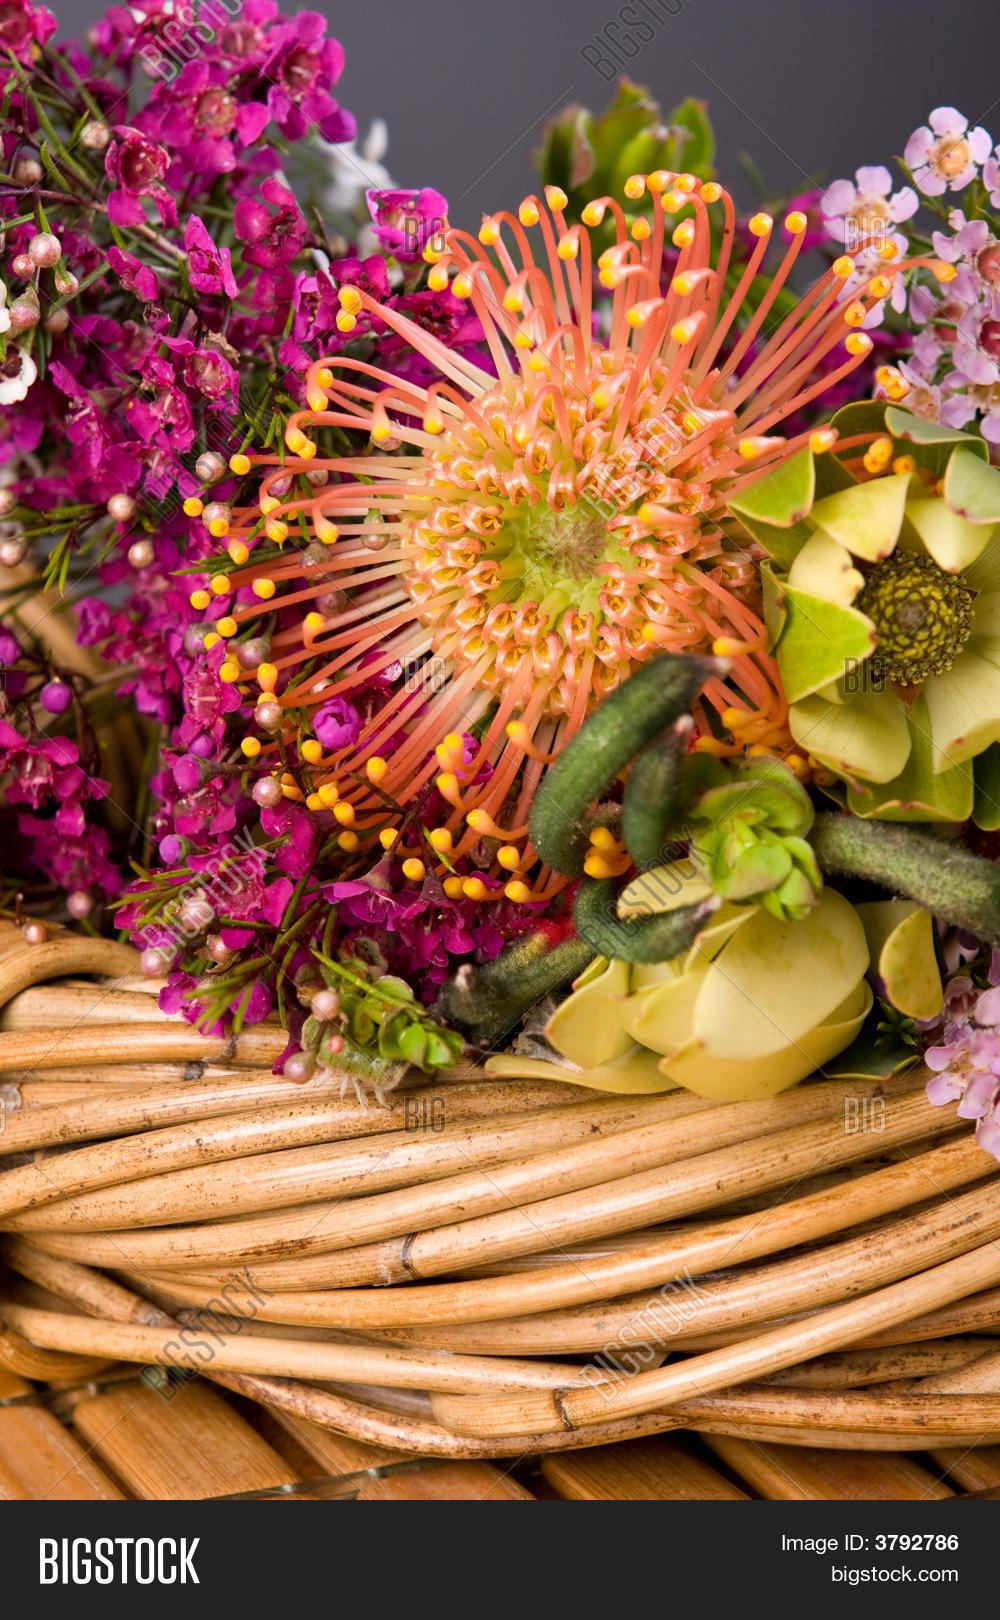 Australian Native Image Photo Free Trial Bigstock